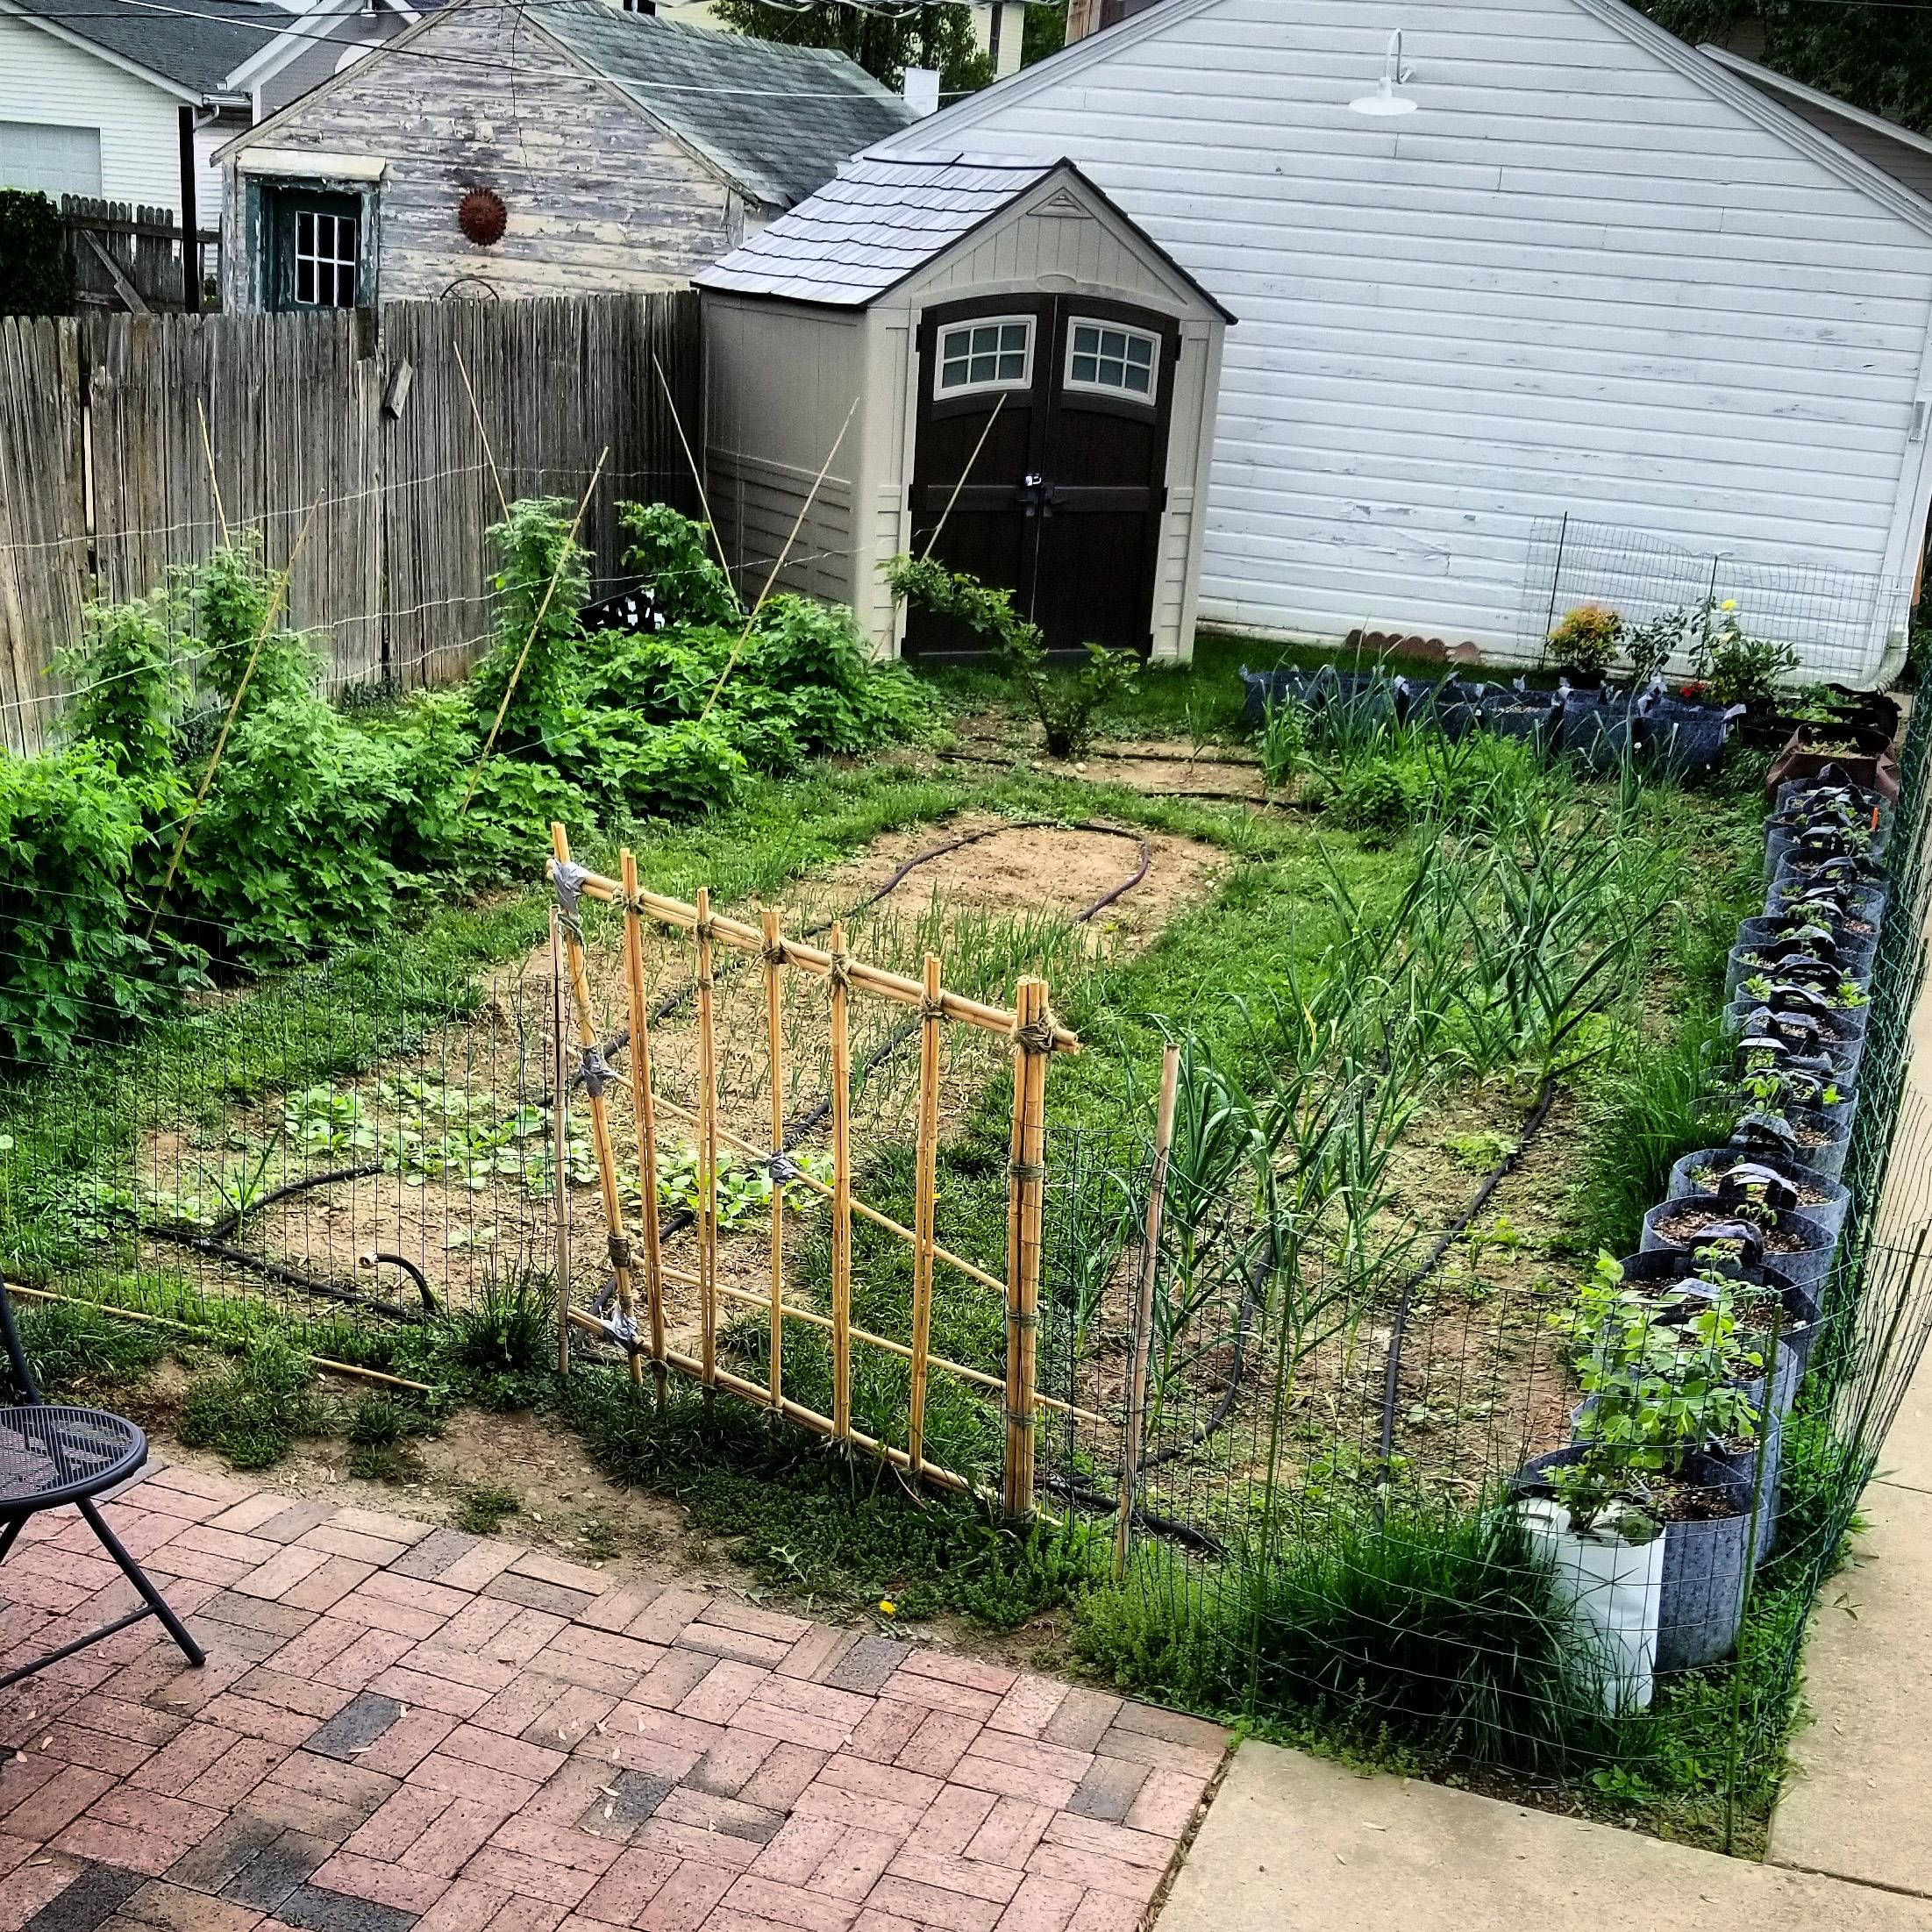 How & Why I Began Gardening